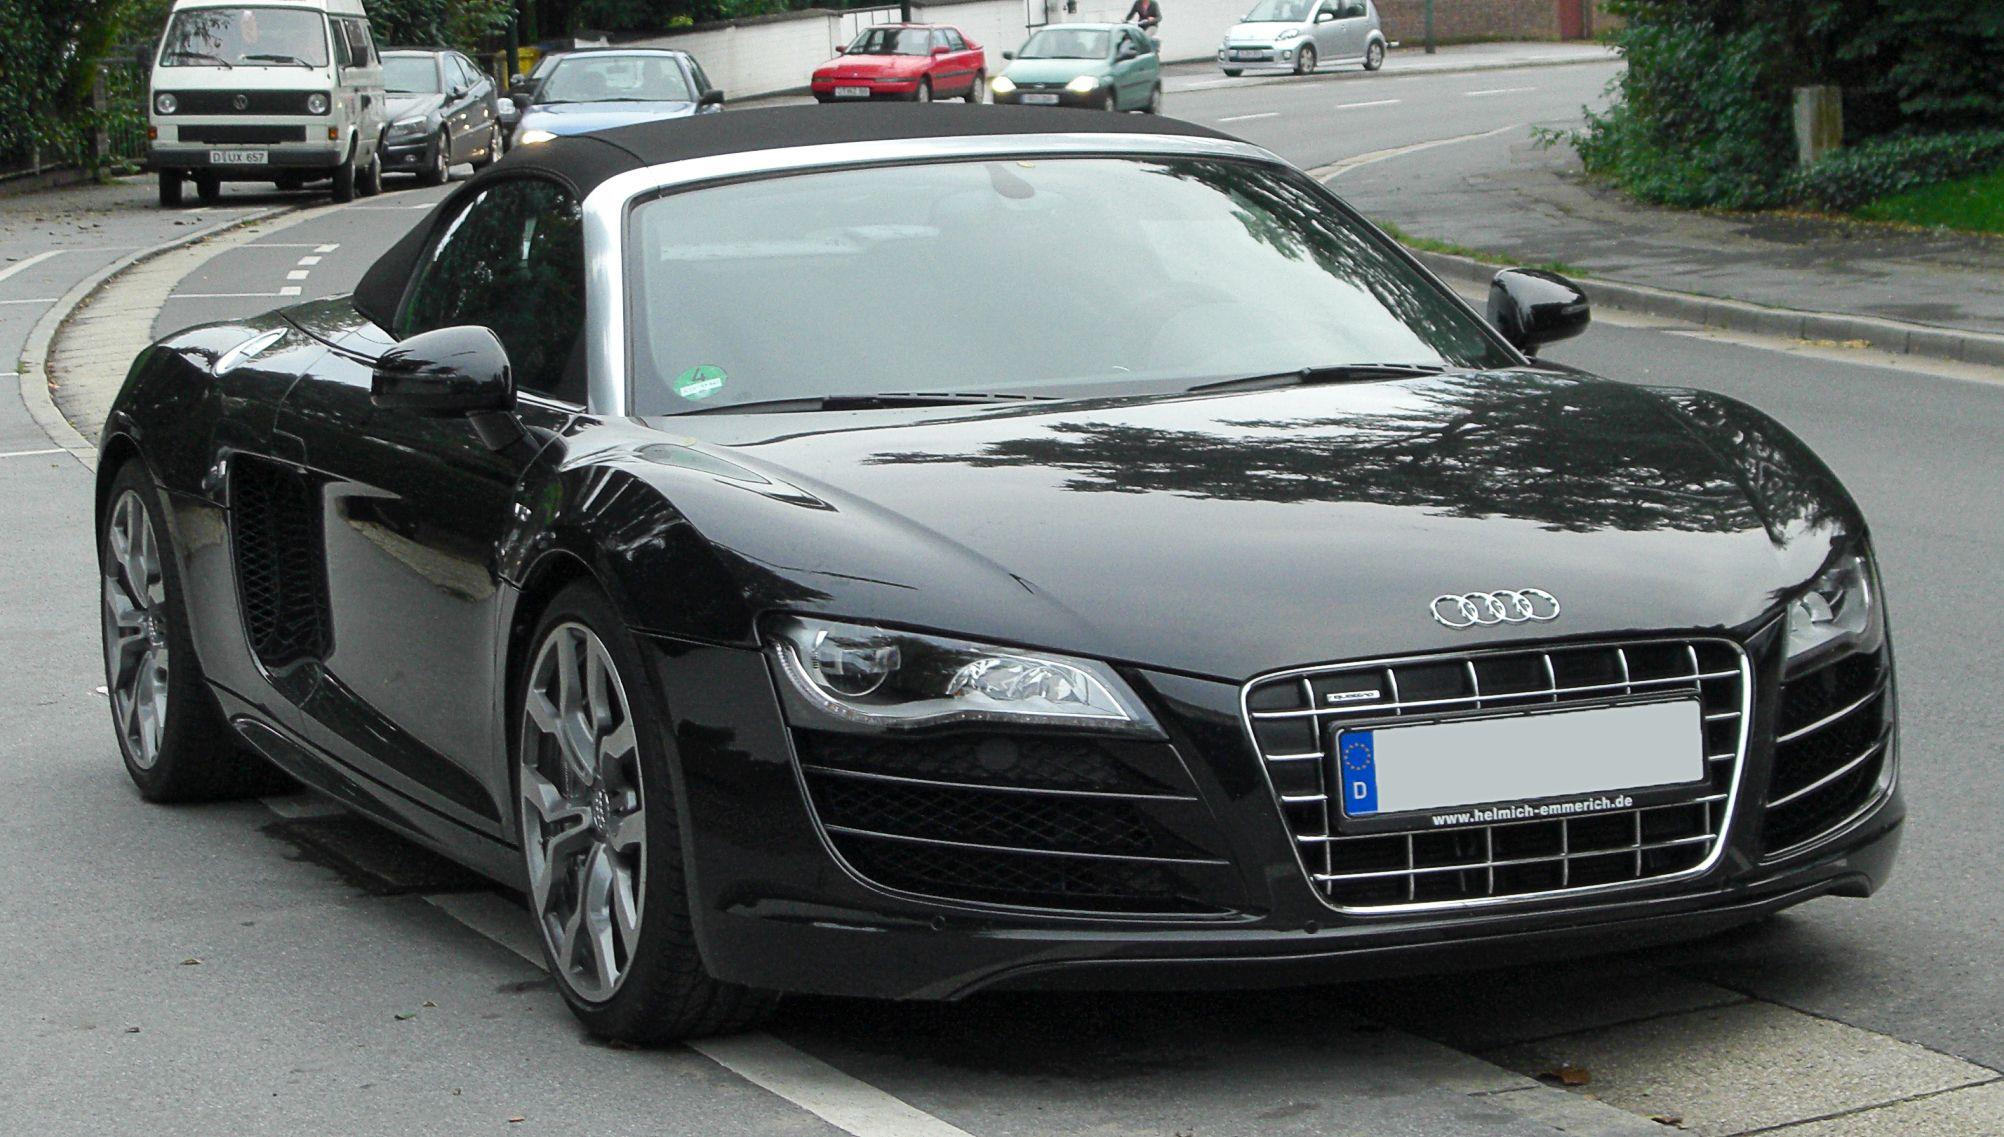 Audi R Spyder Want Pinterest R V Dream Cars And Cars - Audi sports car list